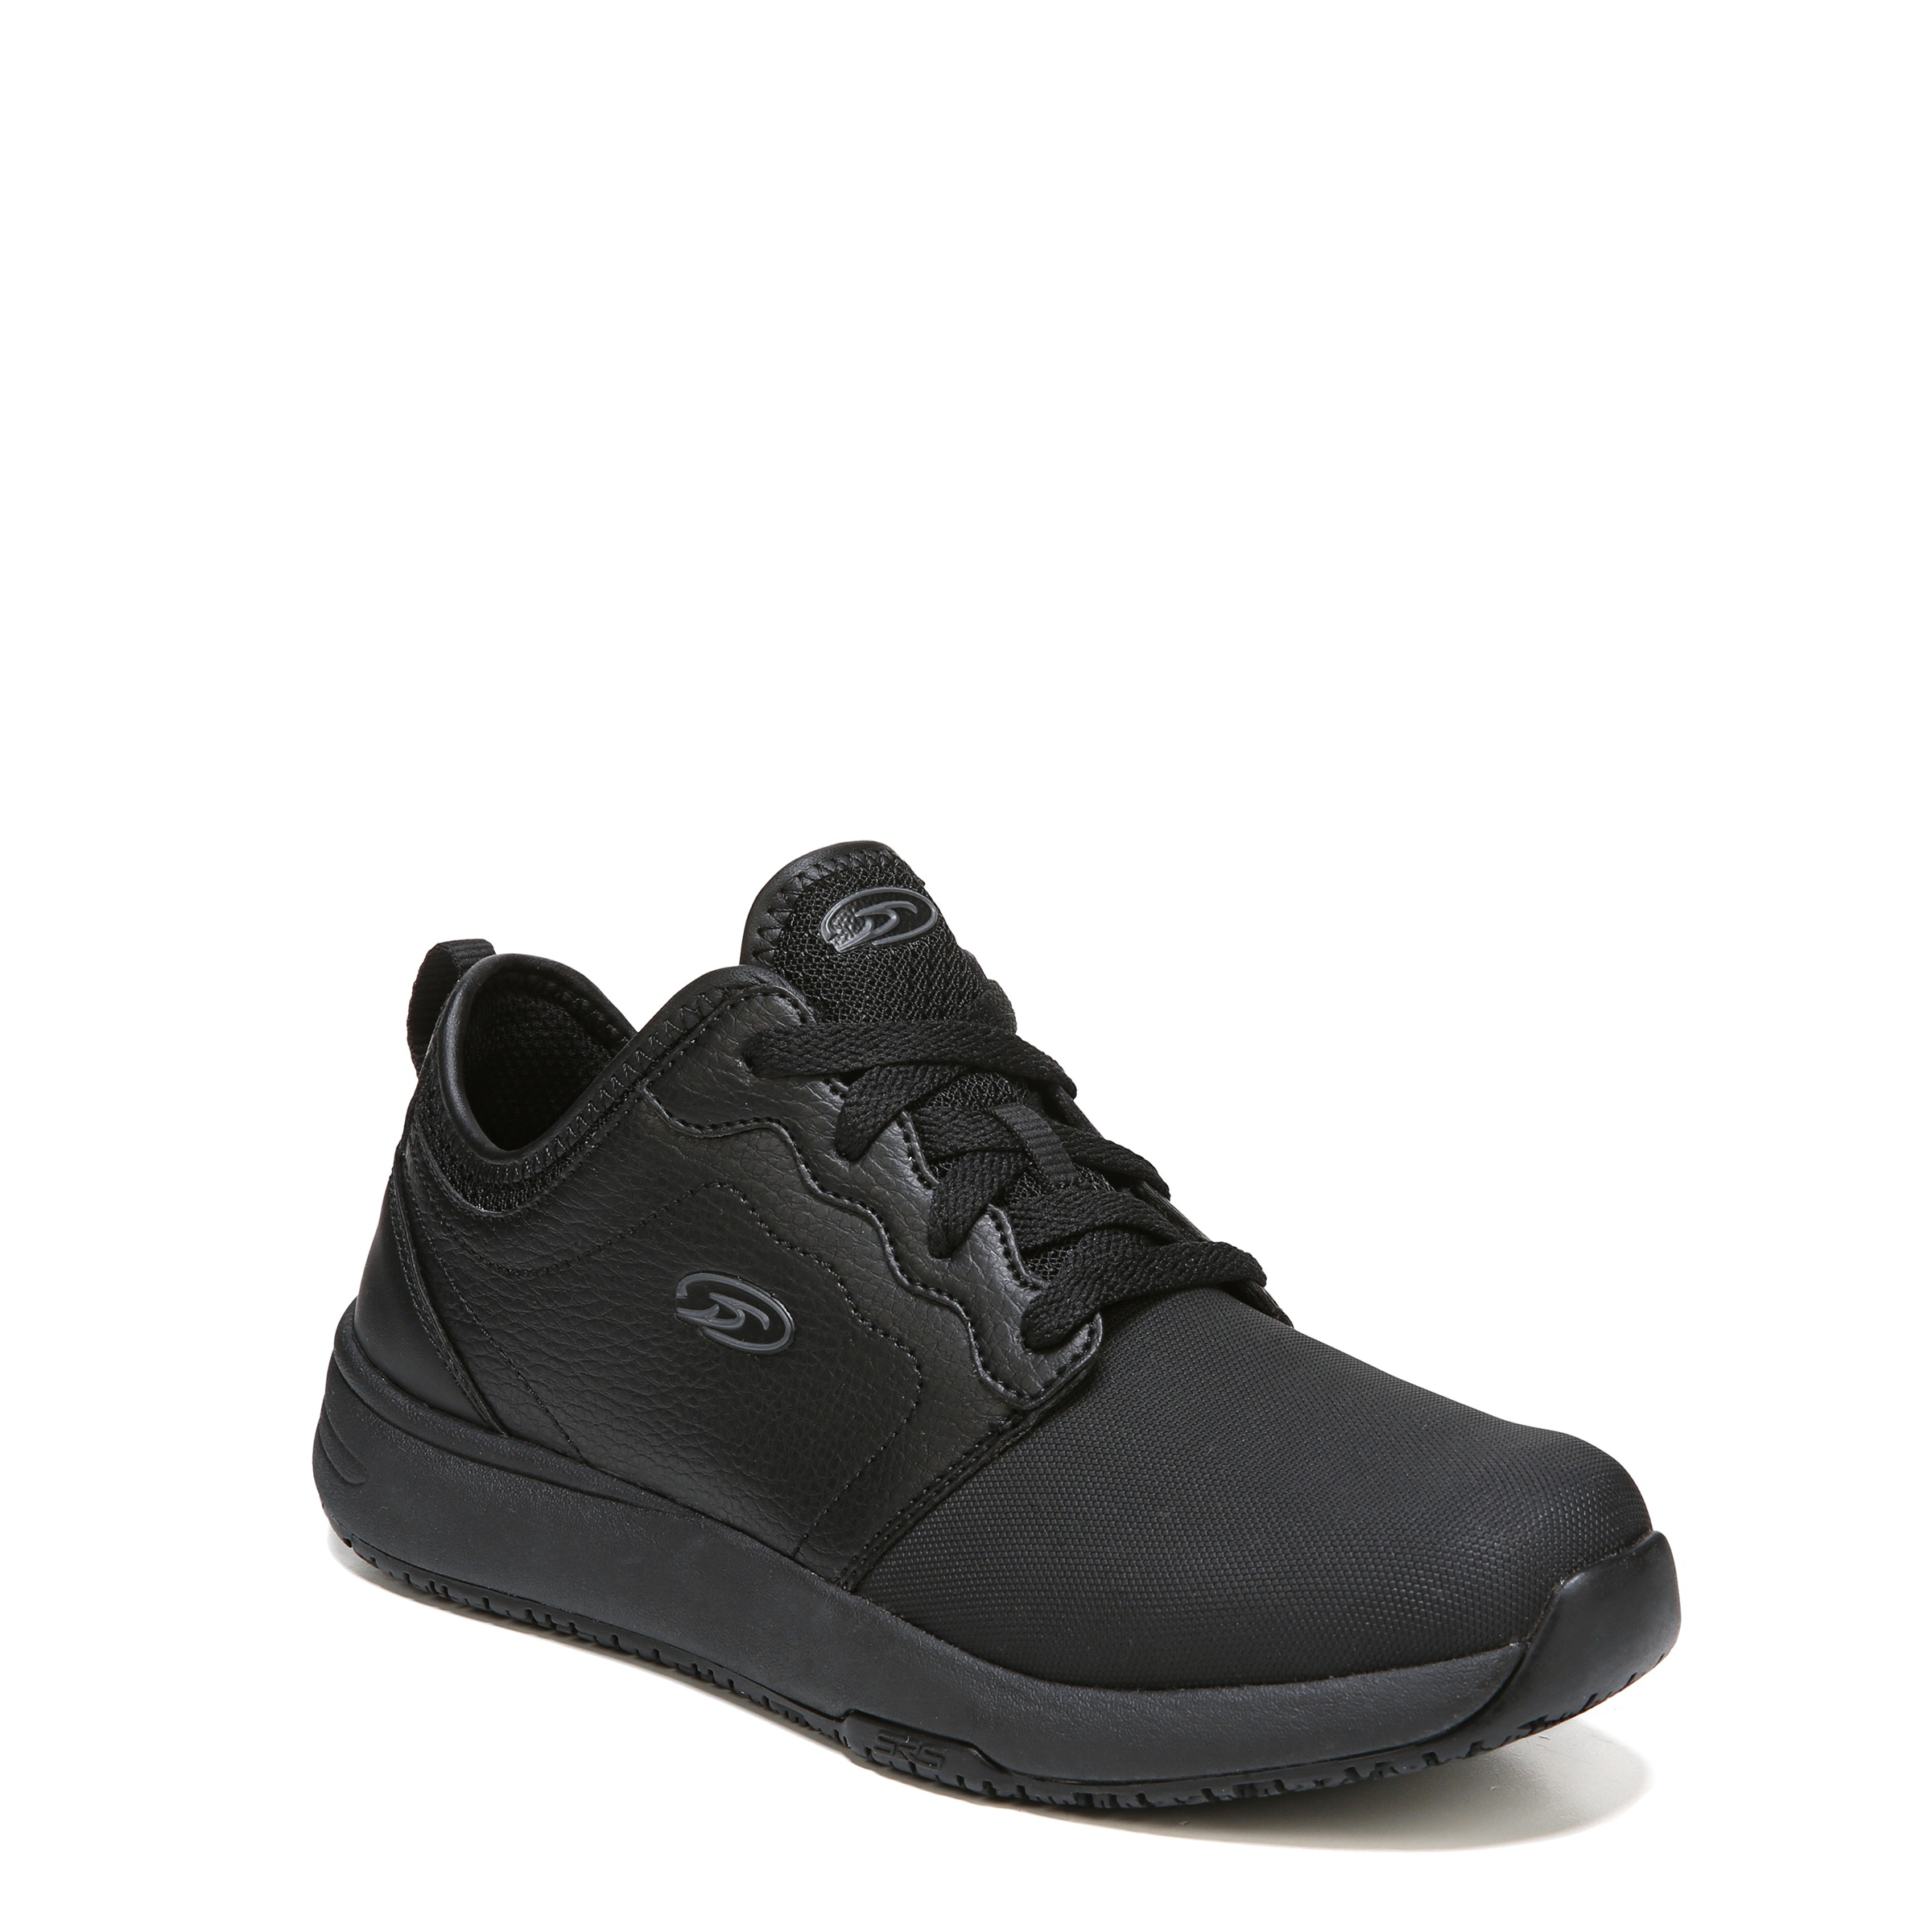 Cheap Work Shoes Slip Resistant